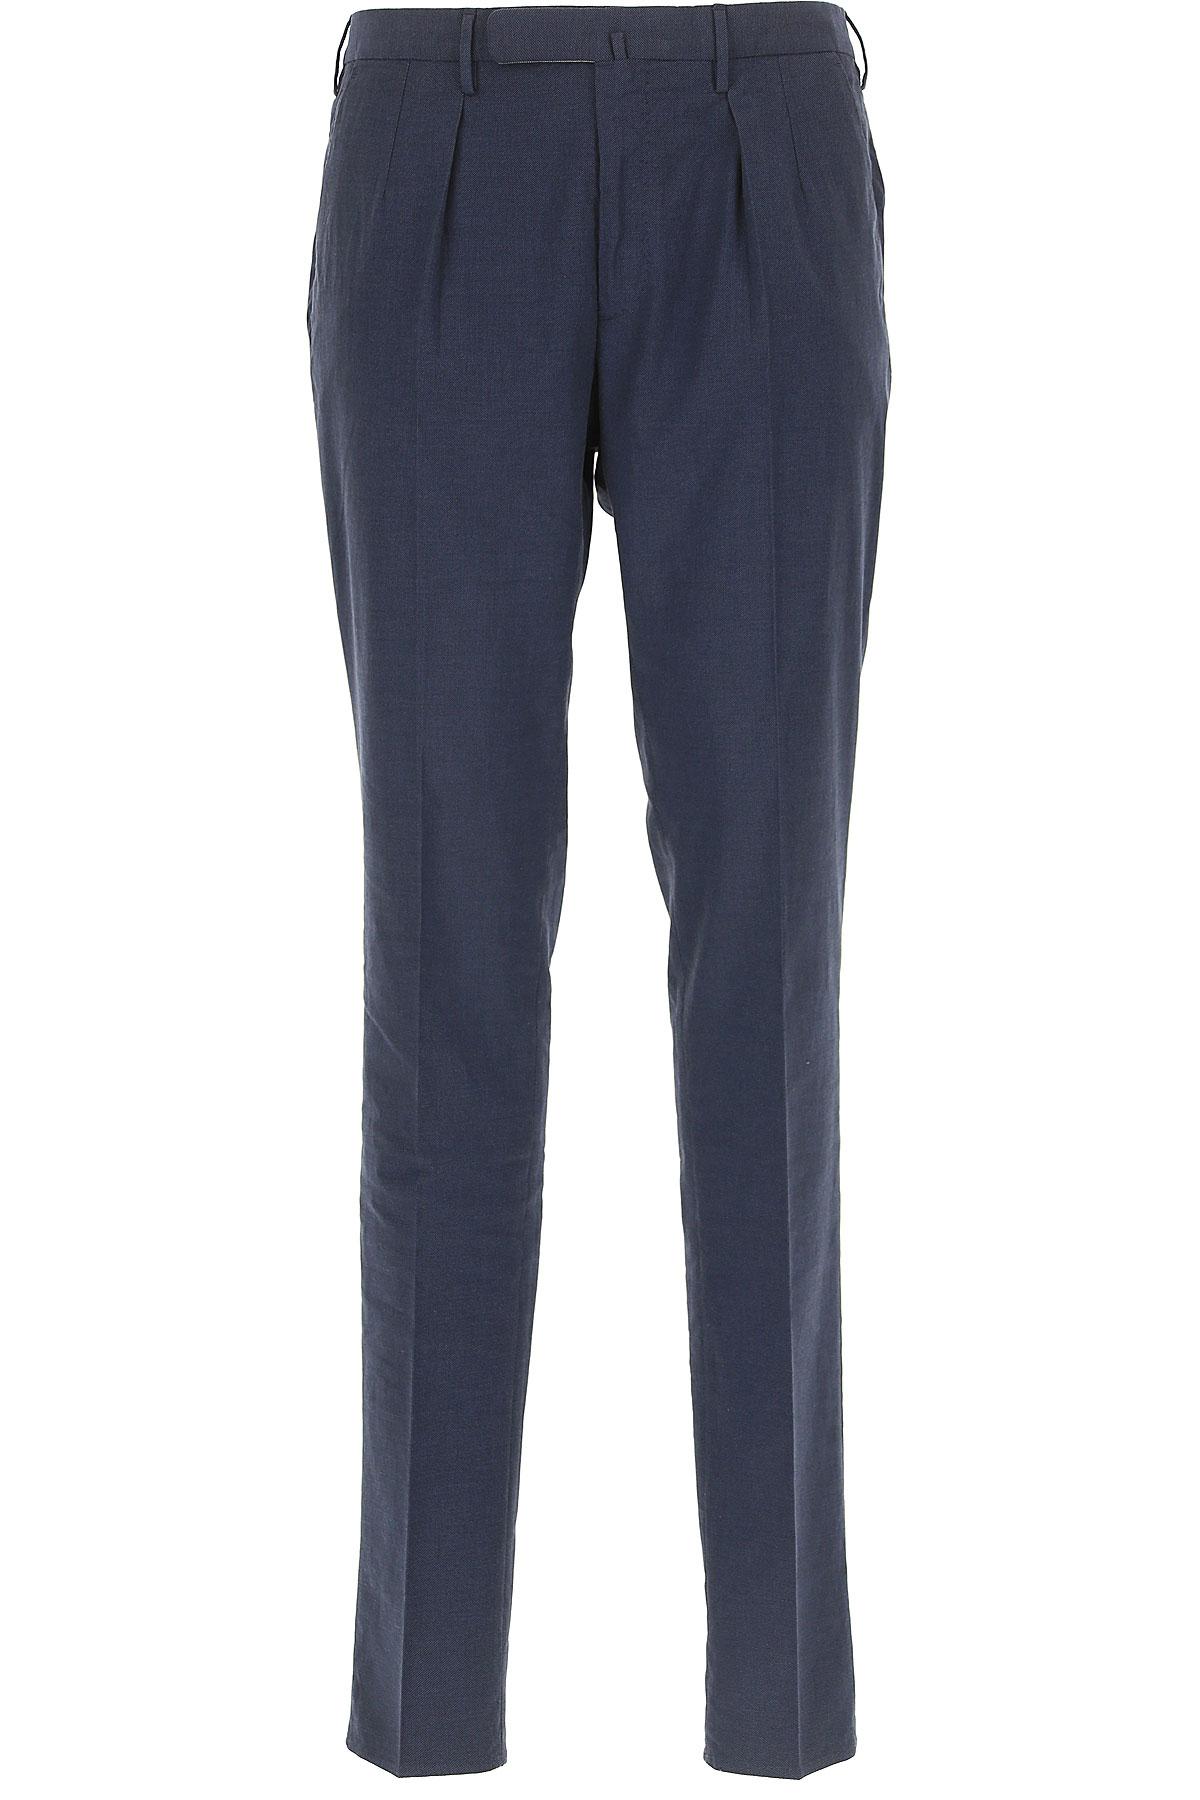 Incotex Pants for Men On Sale, Dark Blue, Cotton, 2019, 34 36